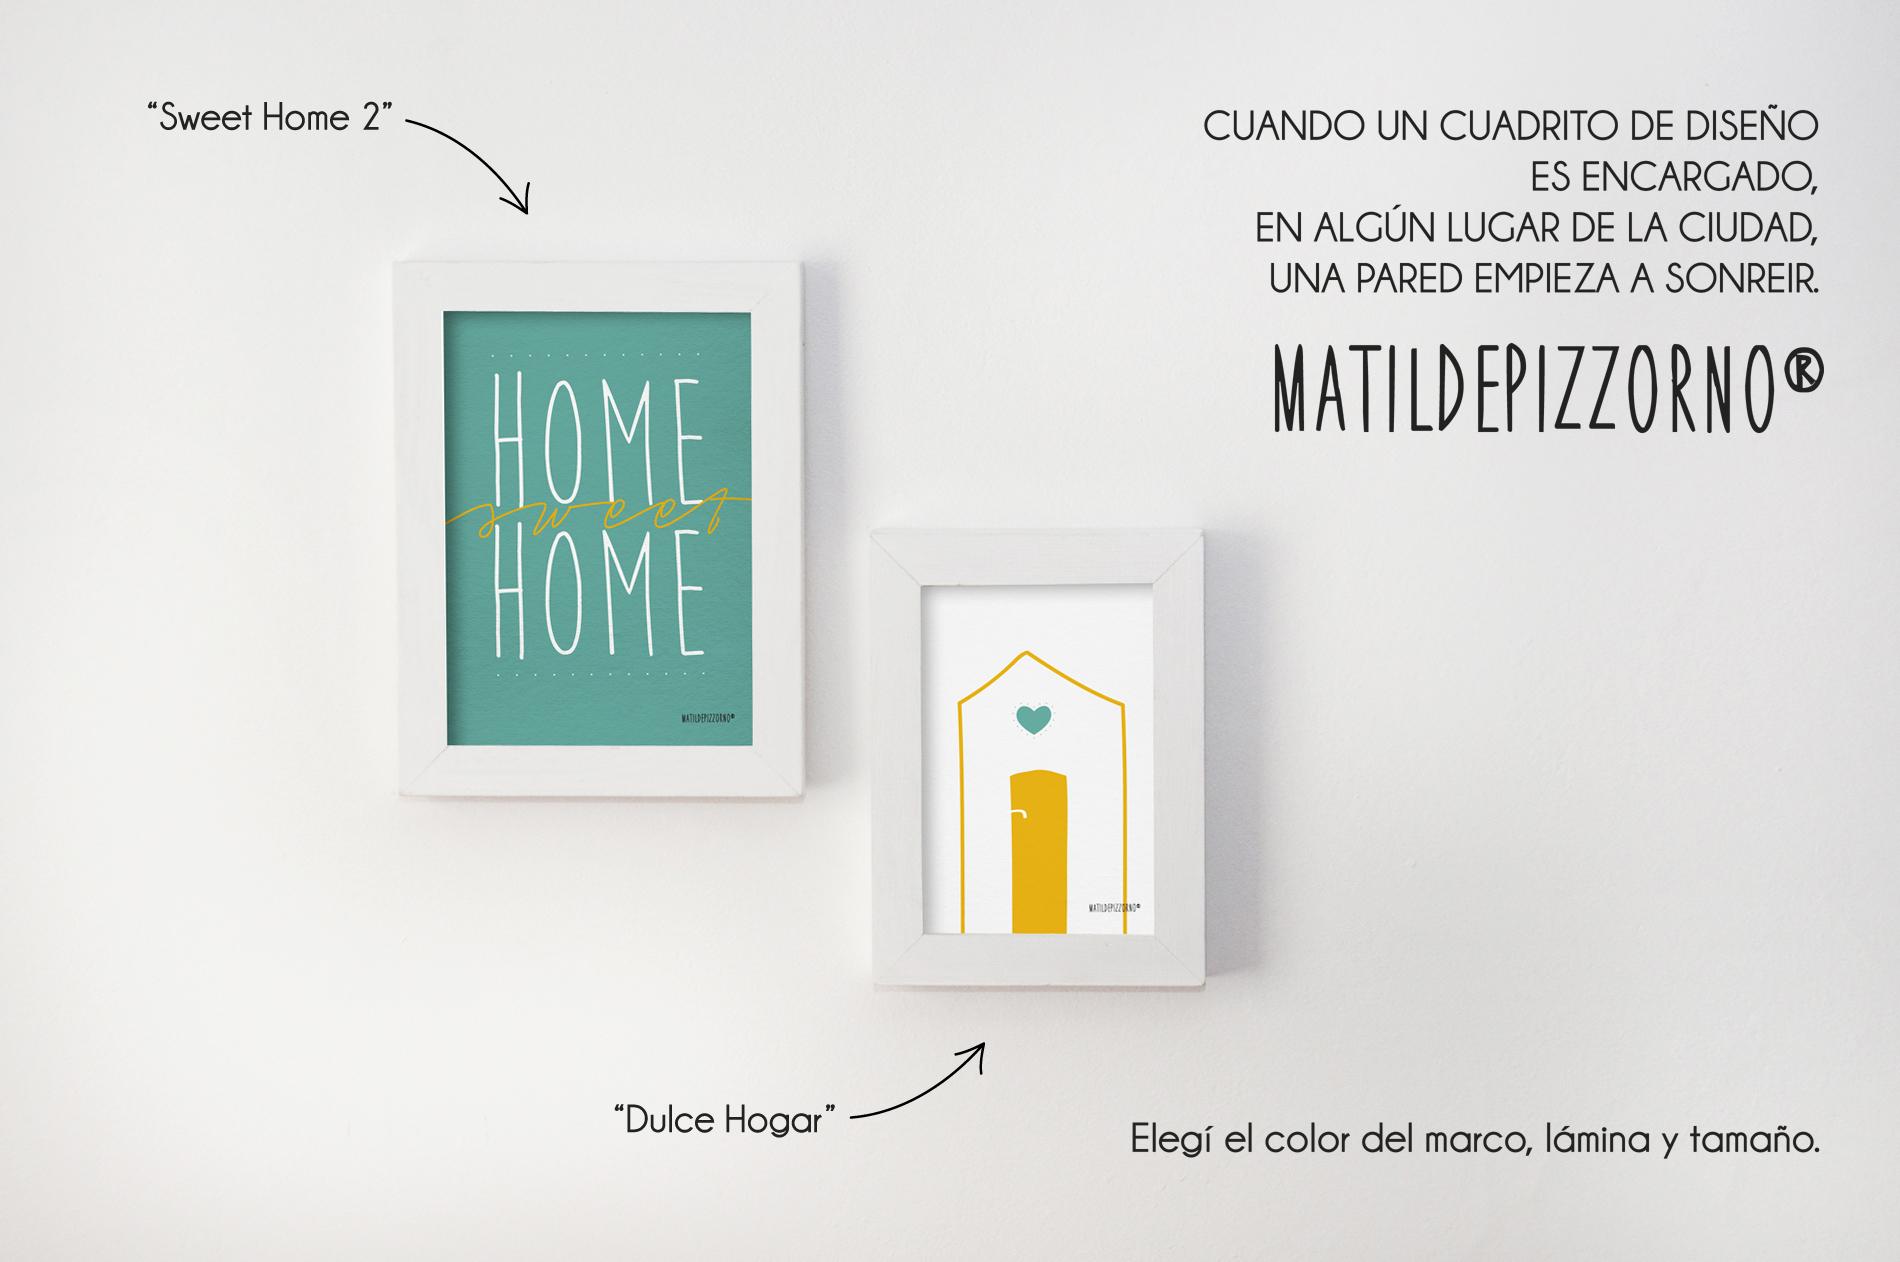 Sweet Home 2, Dulce Hogar